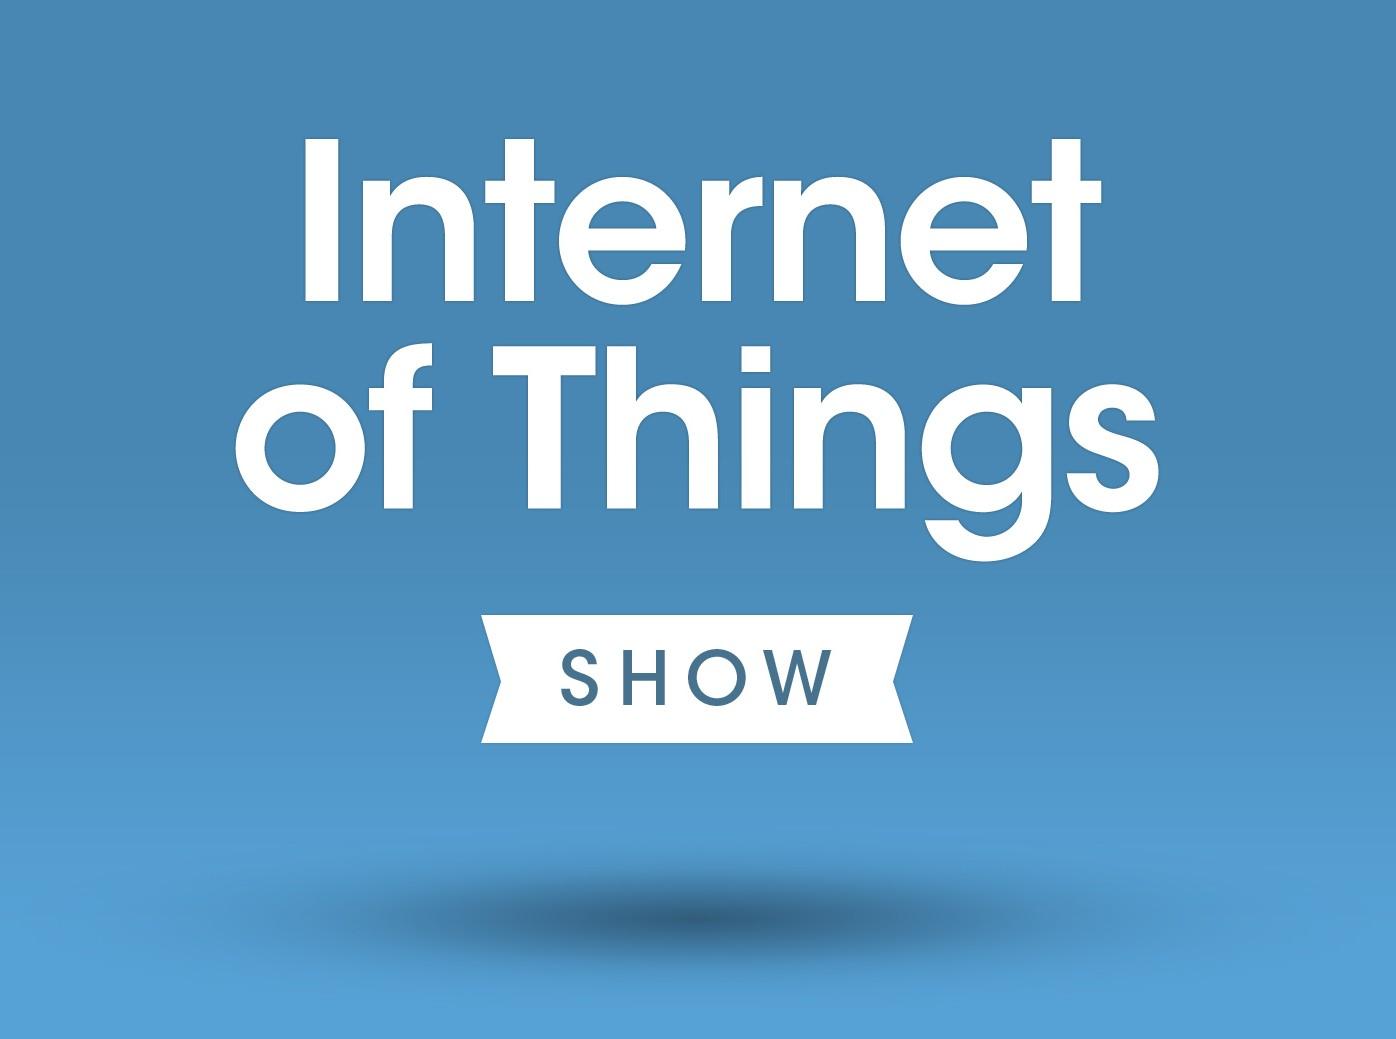 GigaOM-internet-of-things-show_1400x1400